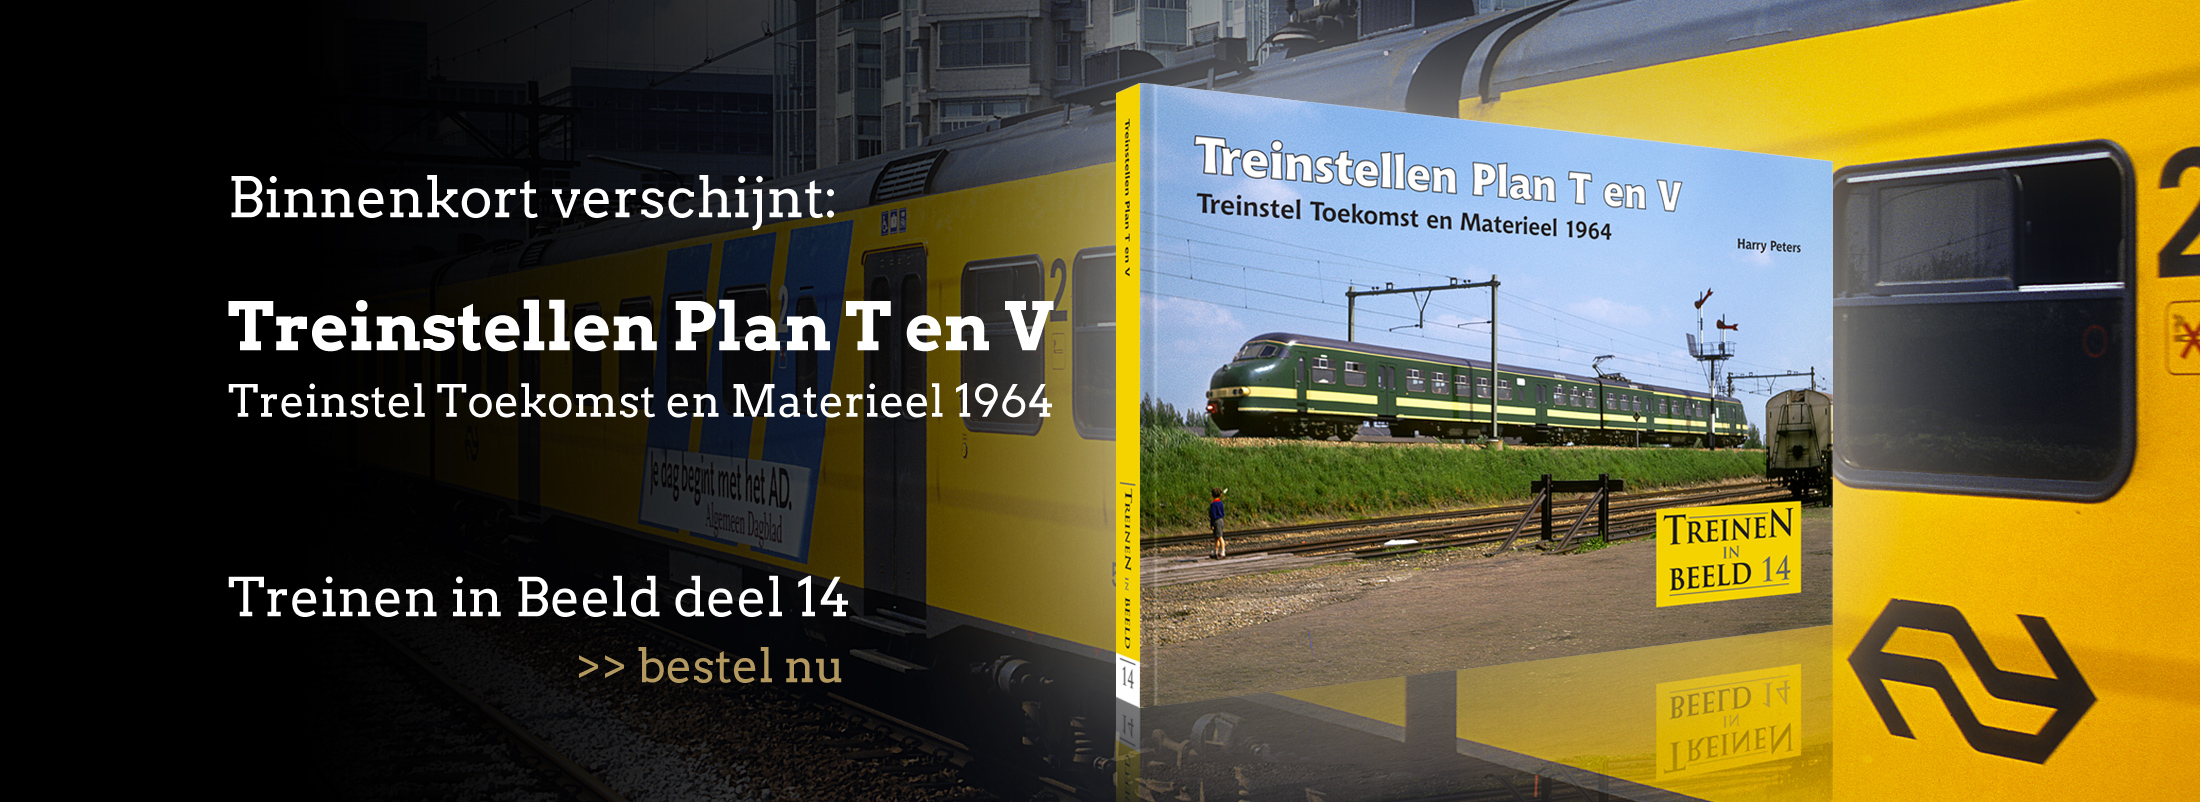 Plan T en V